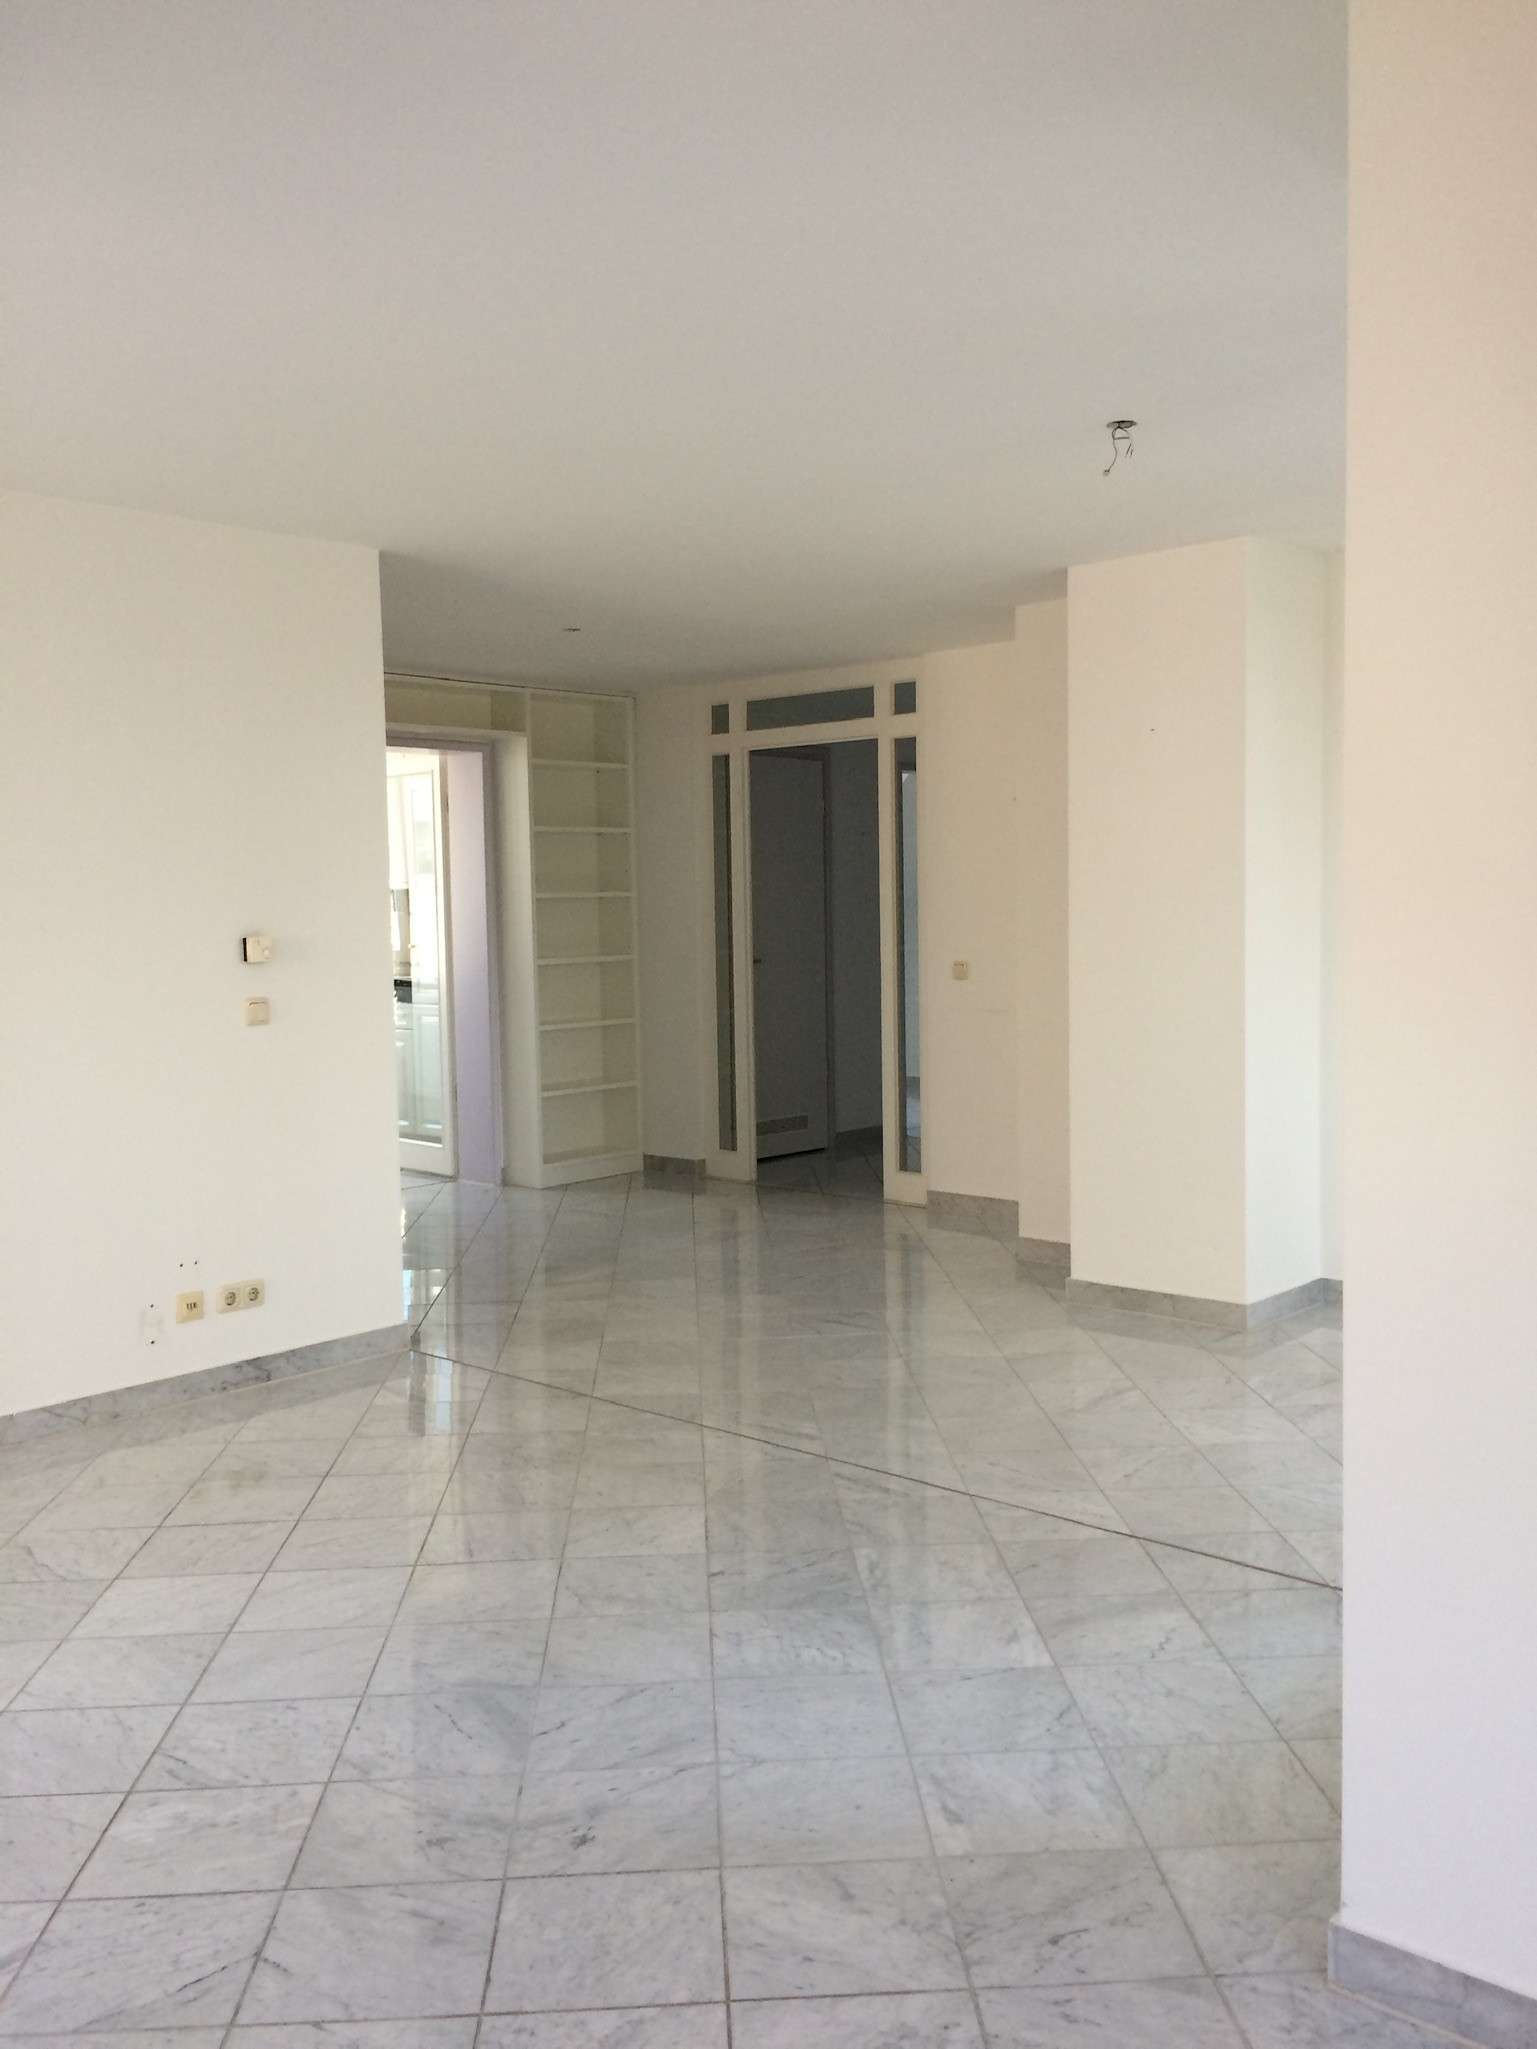 2-3 Zimmer-Dachgeschoss- Wohnung in malerischer Umgebung Isarhochufer Grünwald